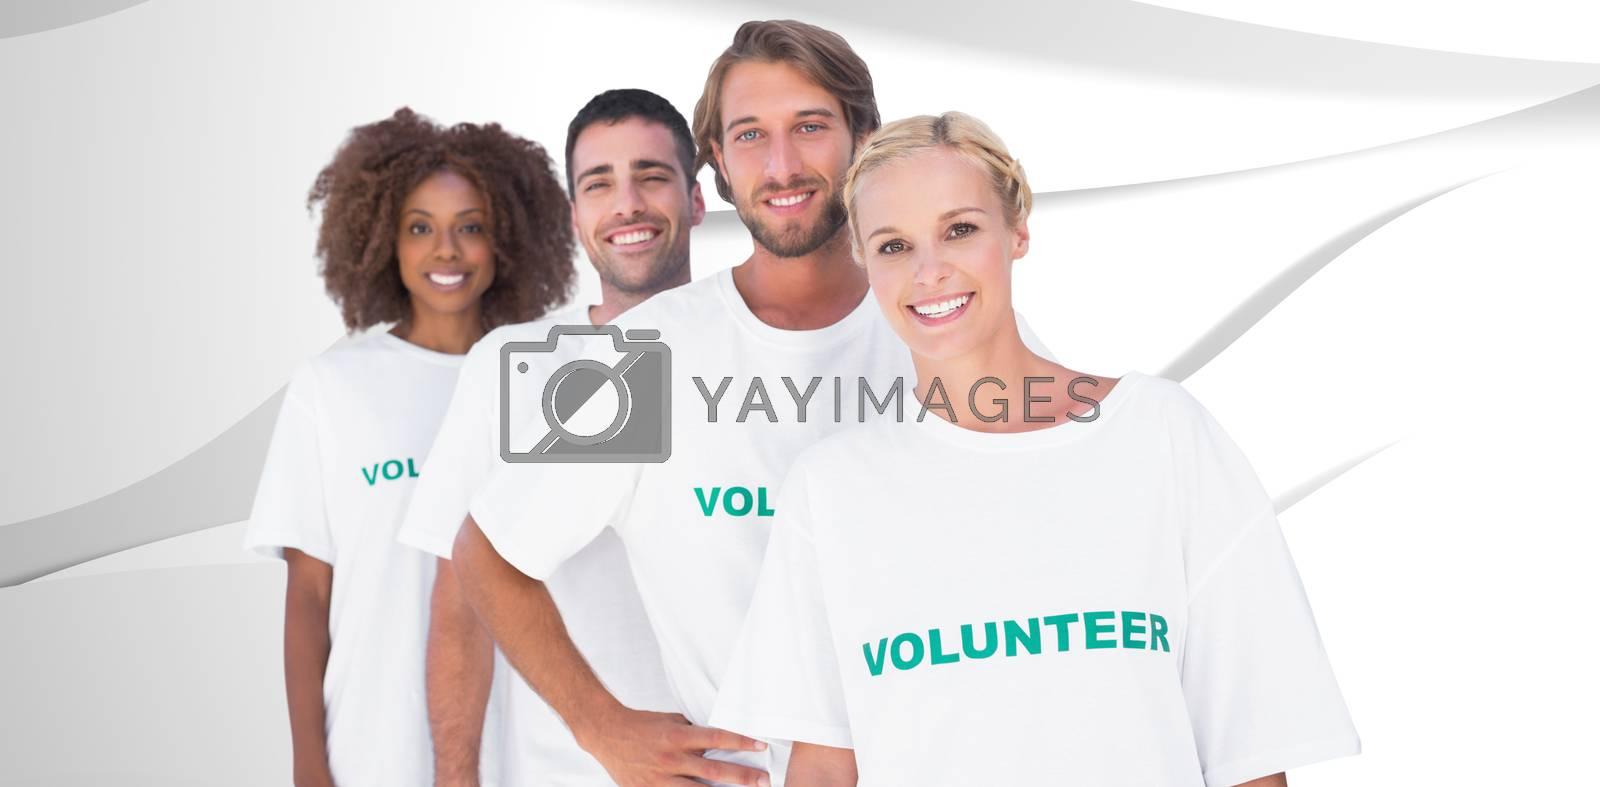 Smiling volunteer group against white wave design